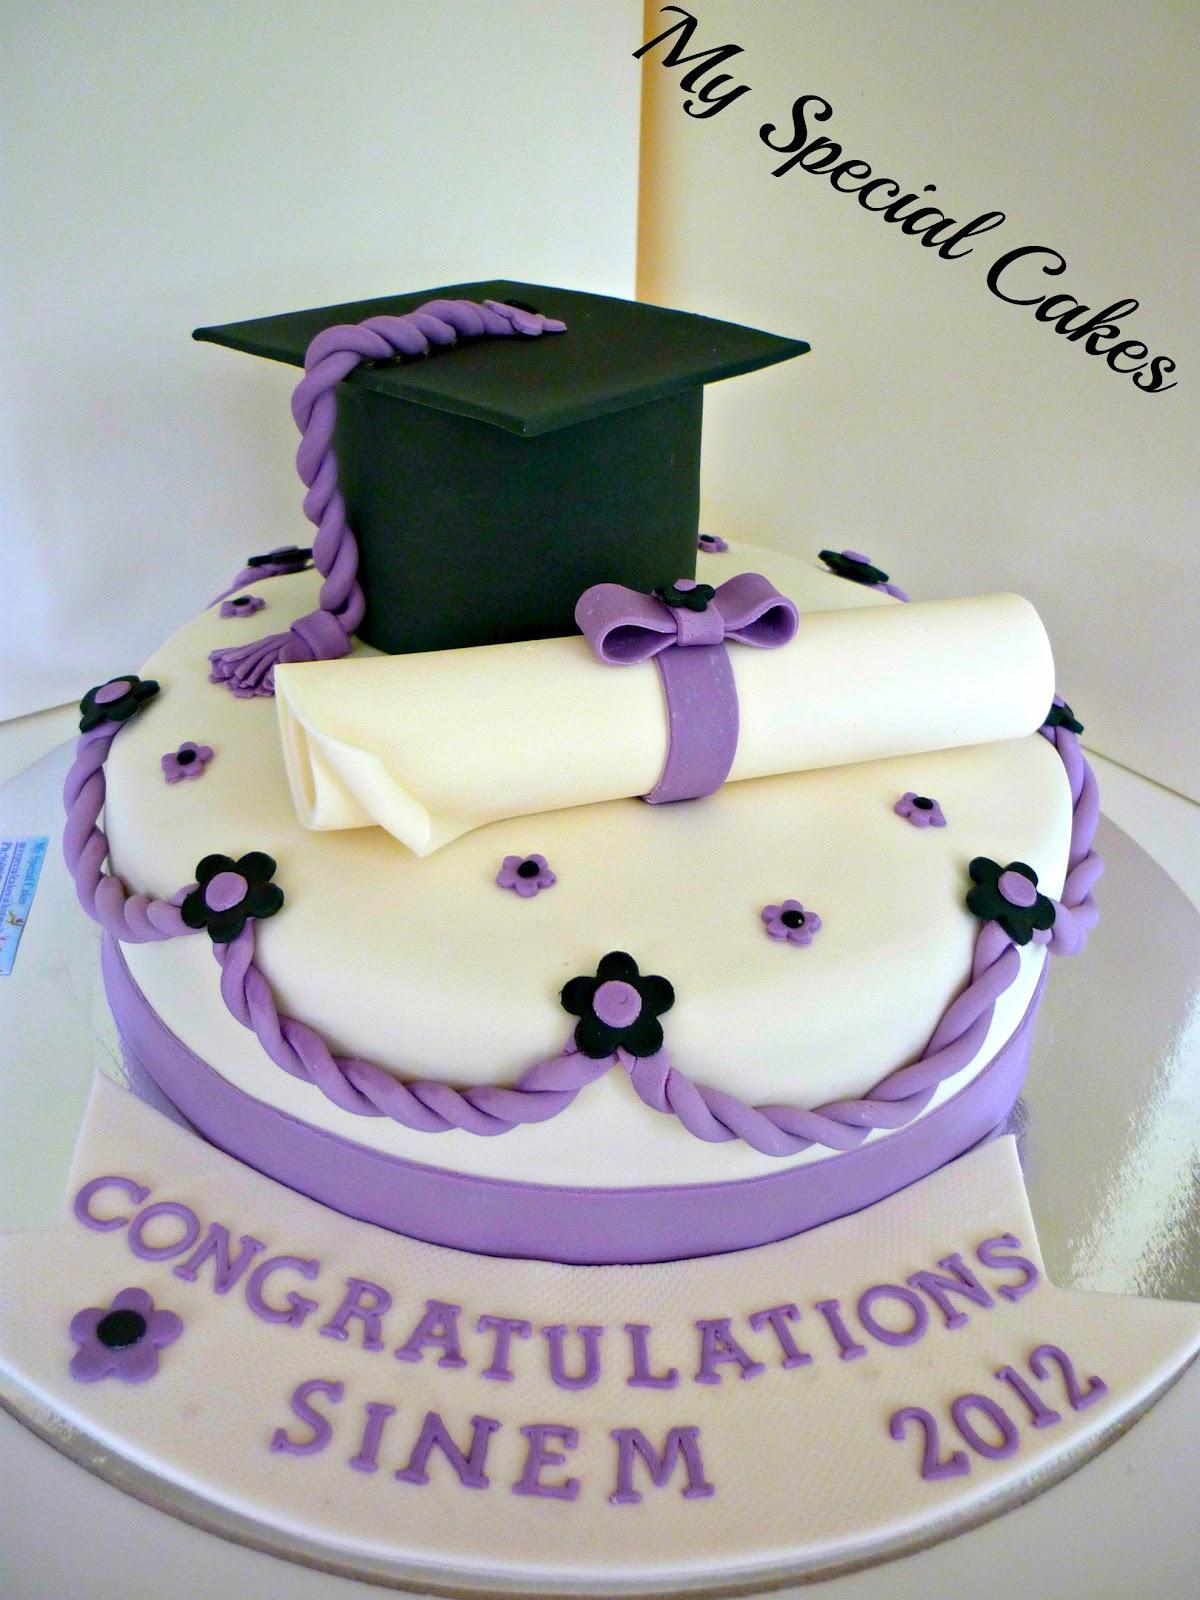 My Special Cakes Graduation Cake